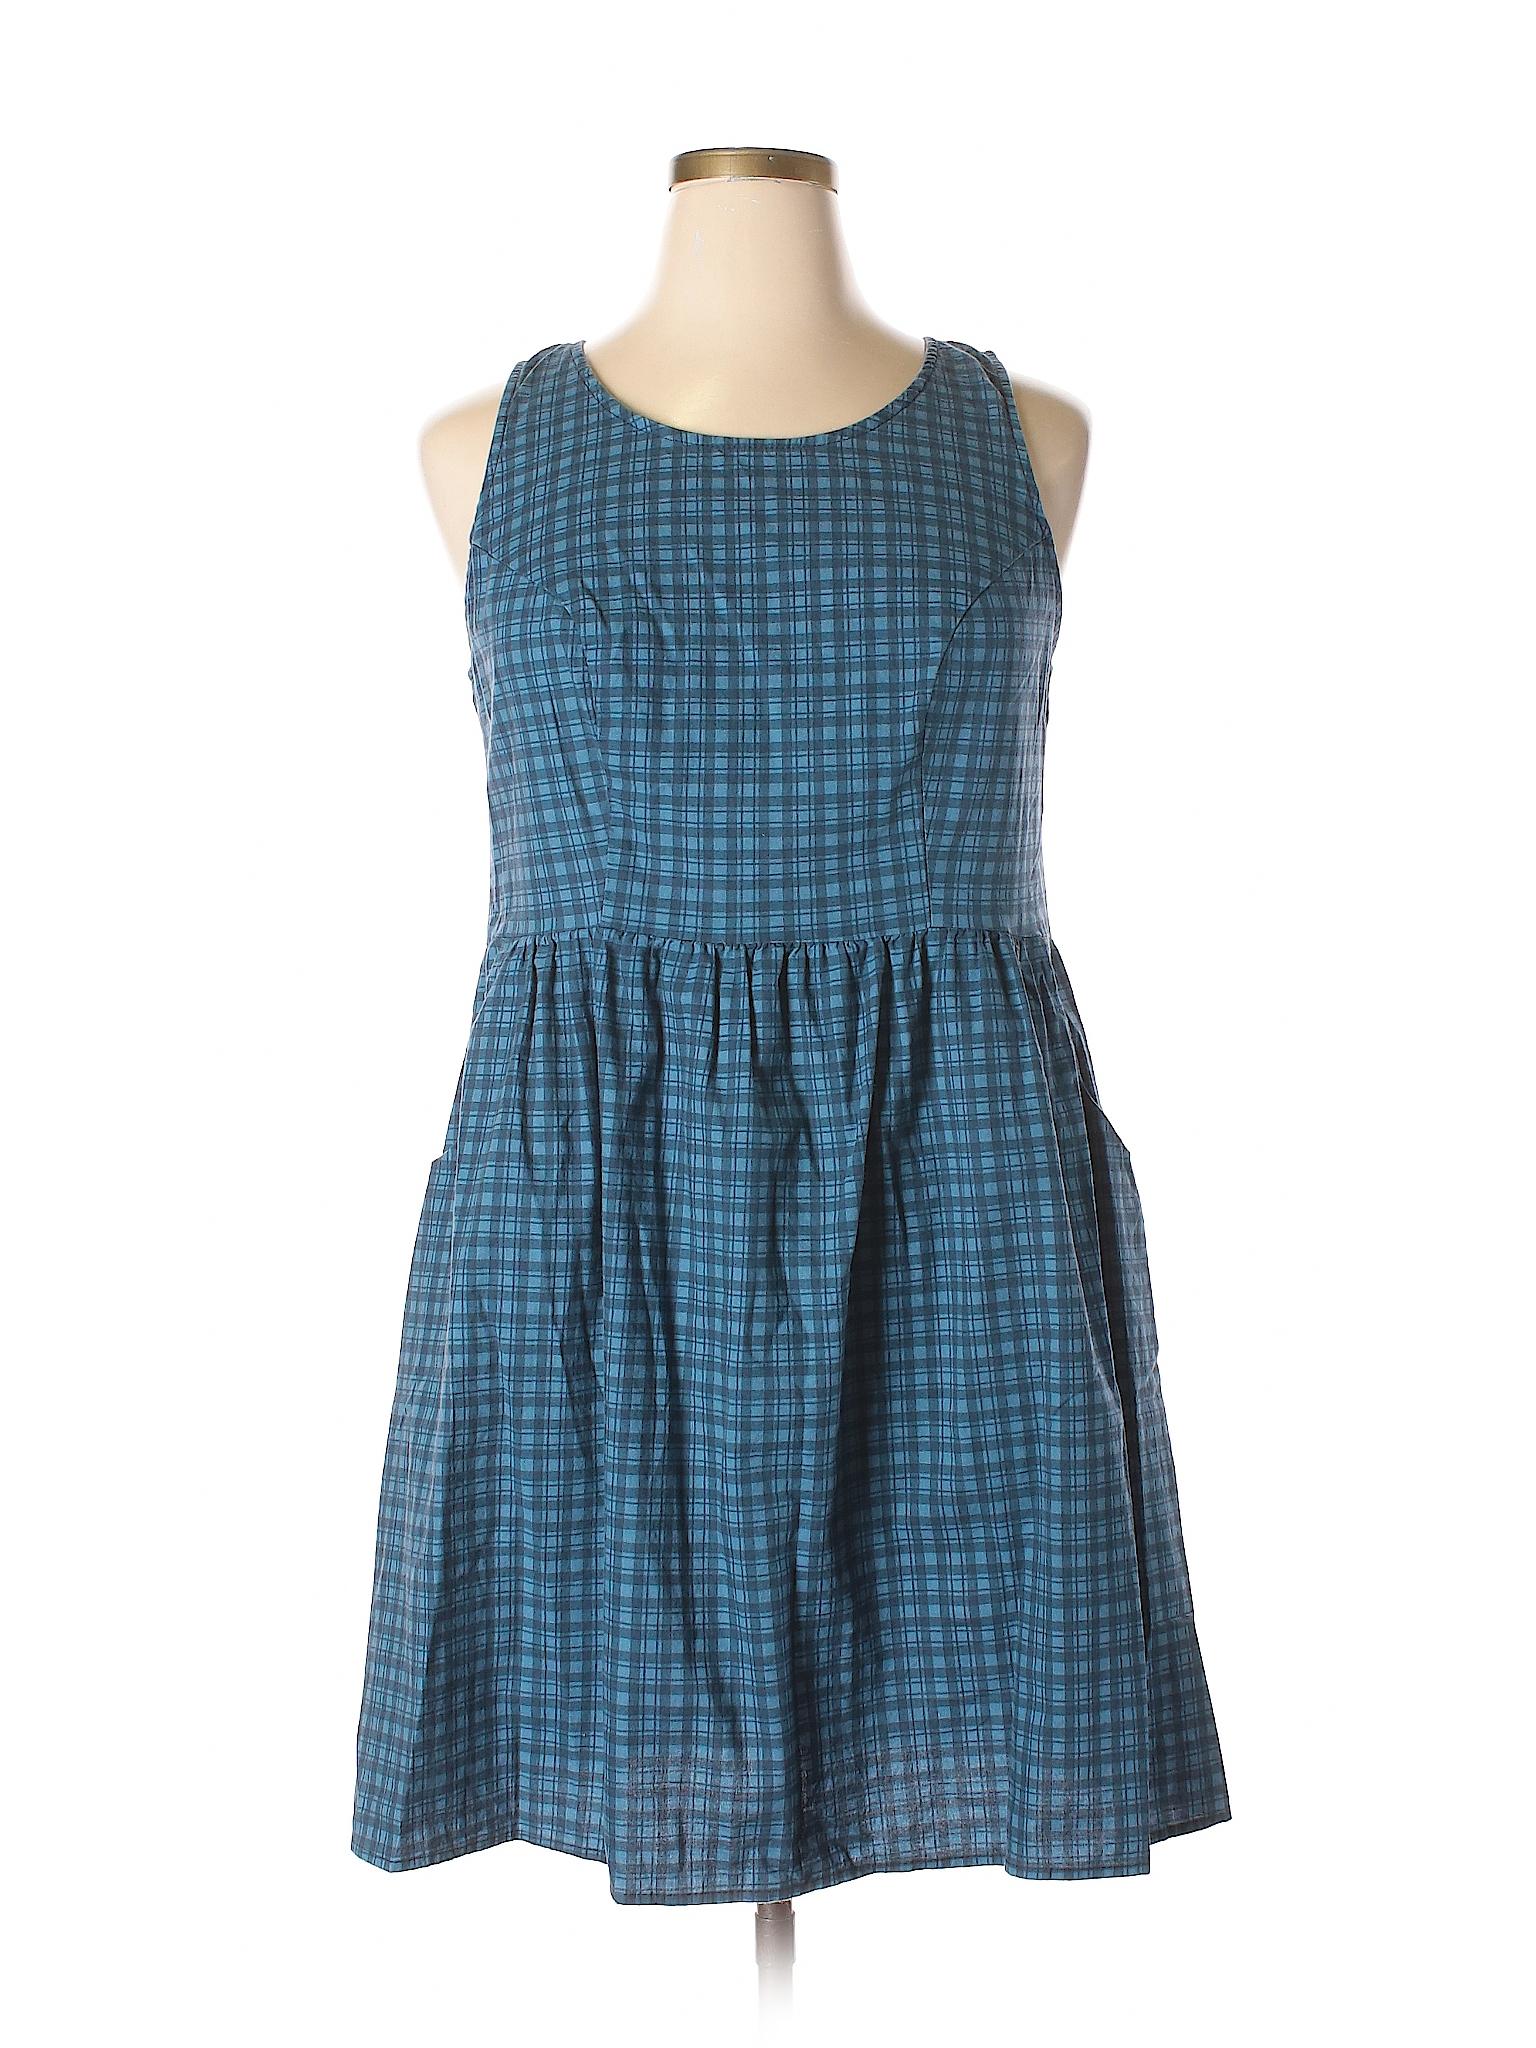 Casual Boutique winter winter Retrolicious Boutique Dress q8gq7